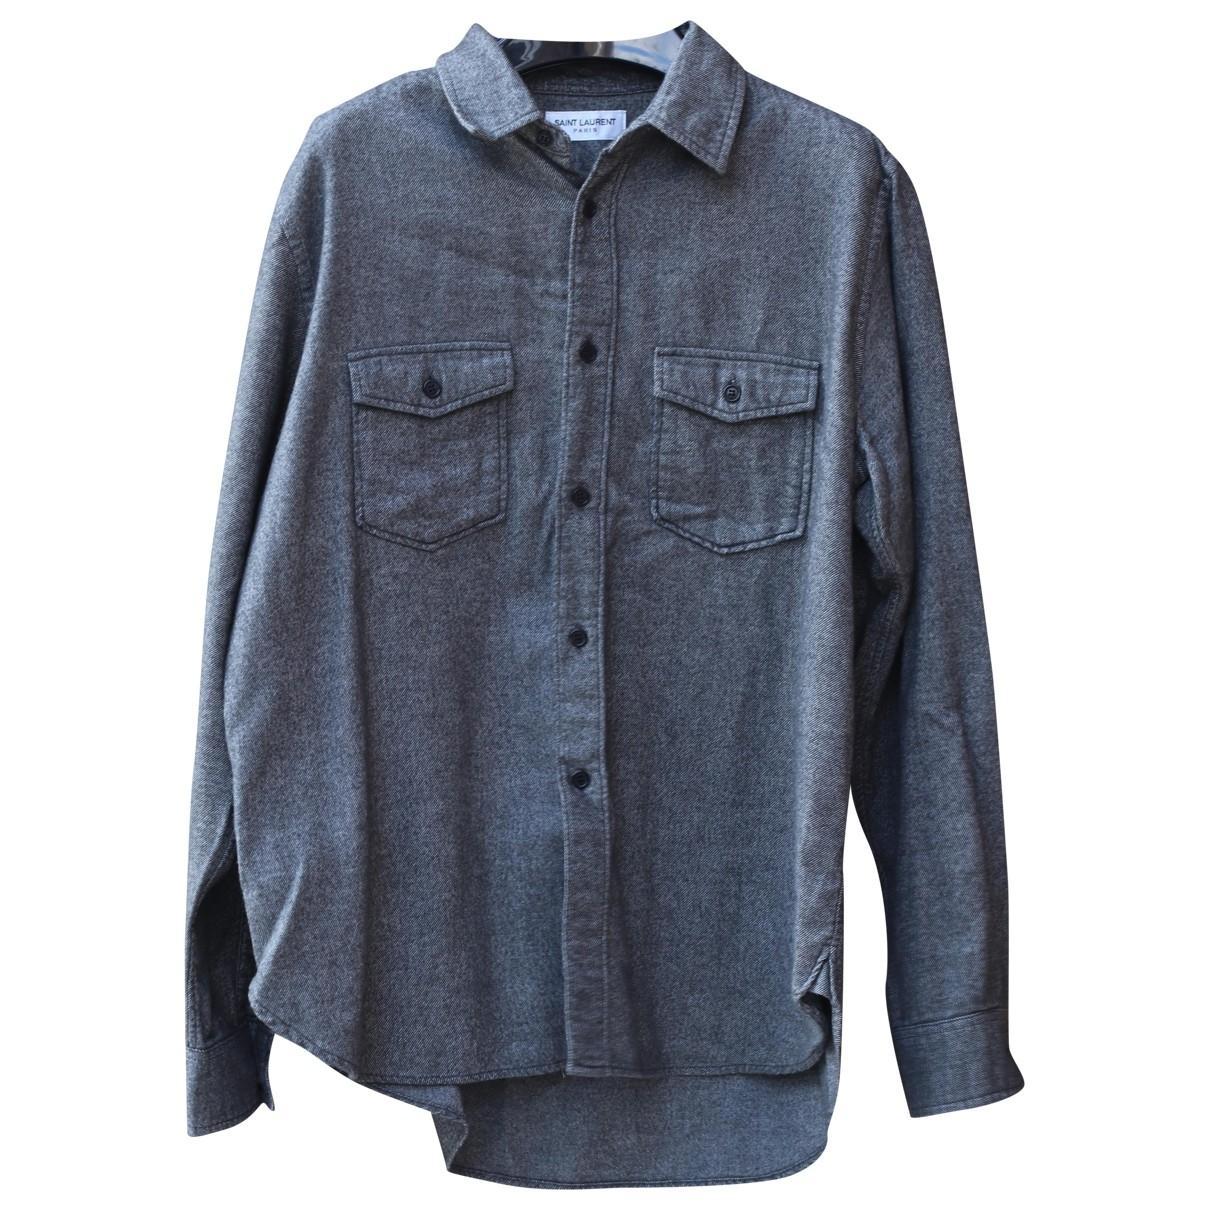 Saint Laurent \N Grey Cotton Shirts for Men S International